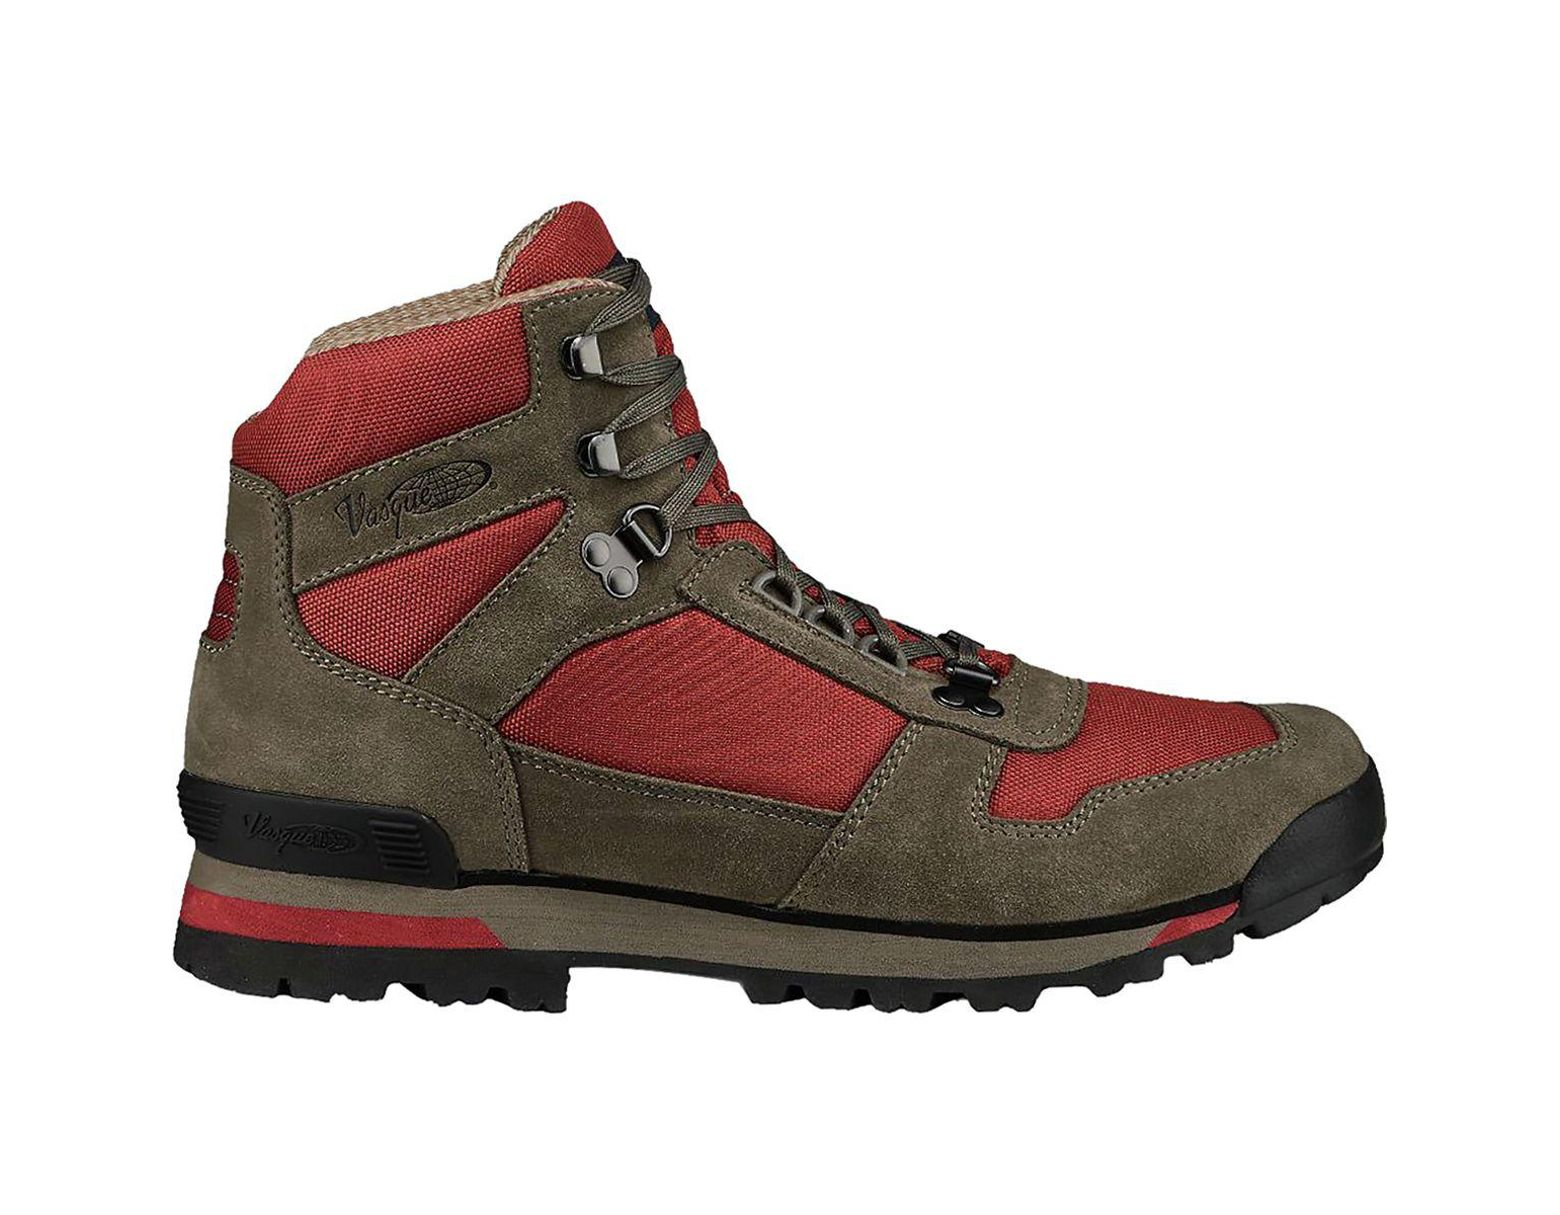 ff514b8fdff Men's Clarion '88 Hiking Boot